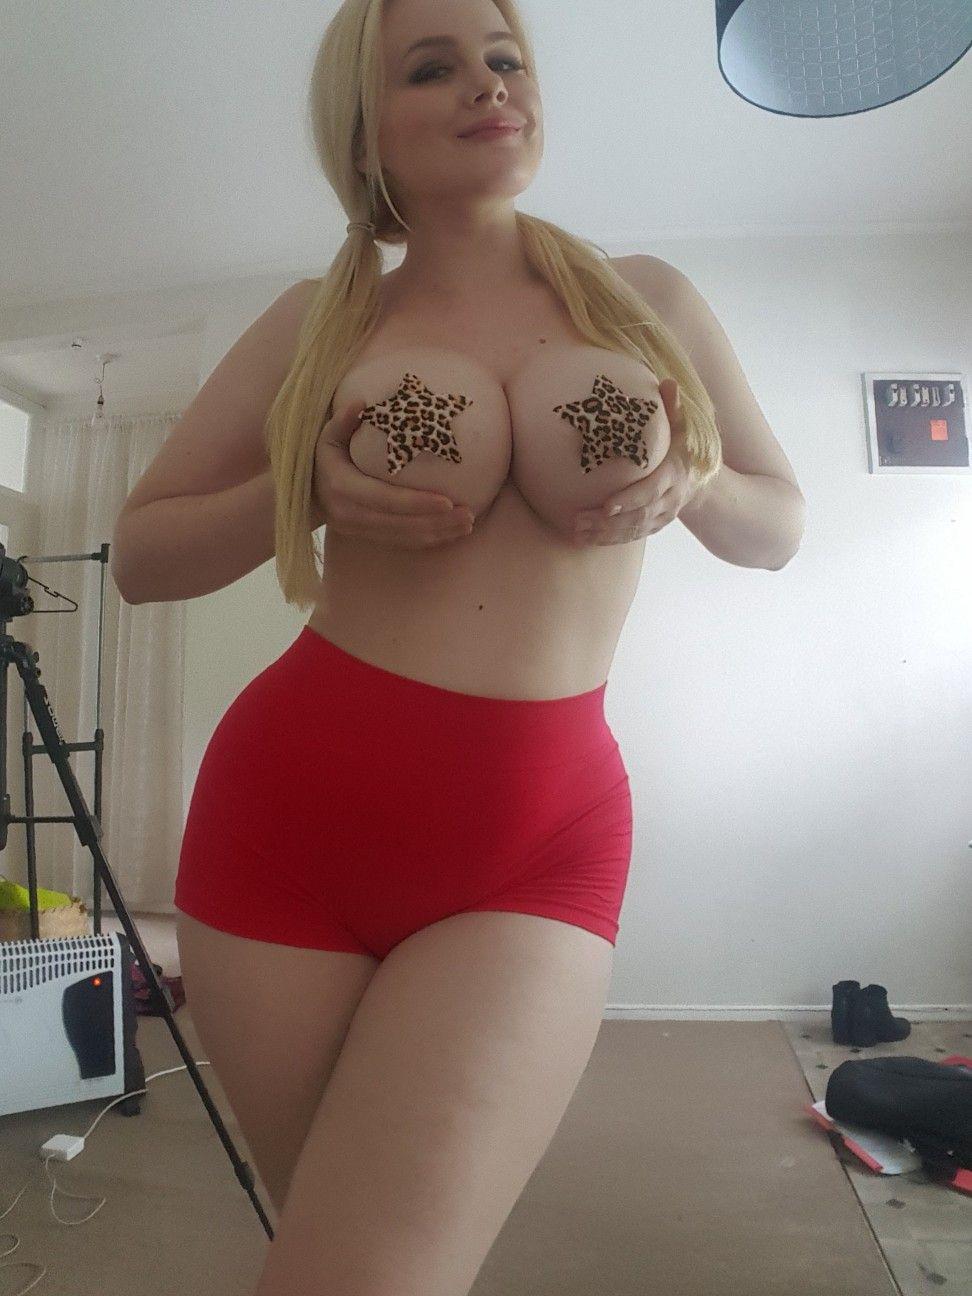 Lilli luxe boobs